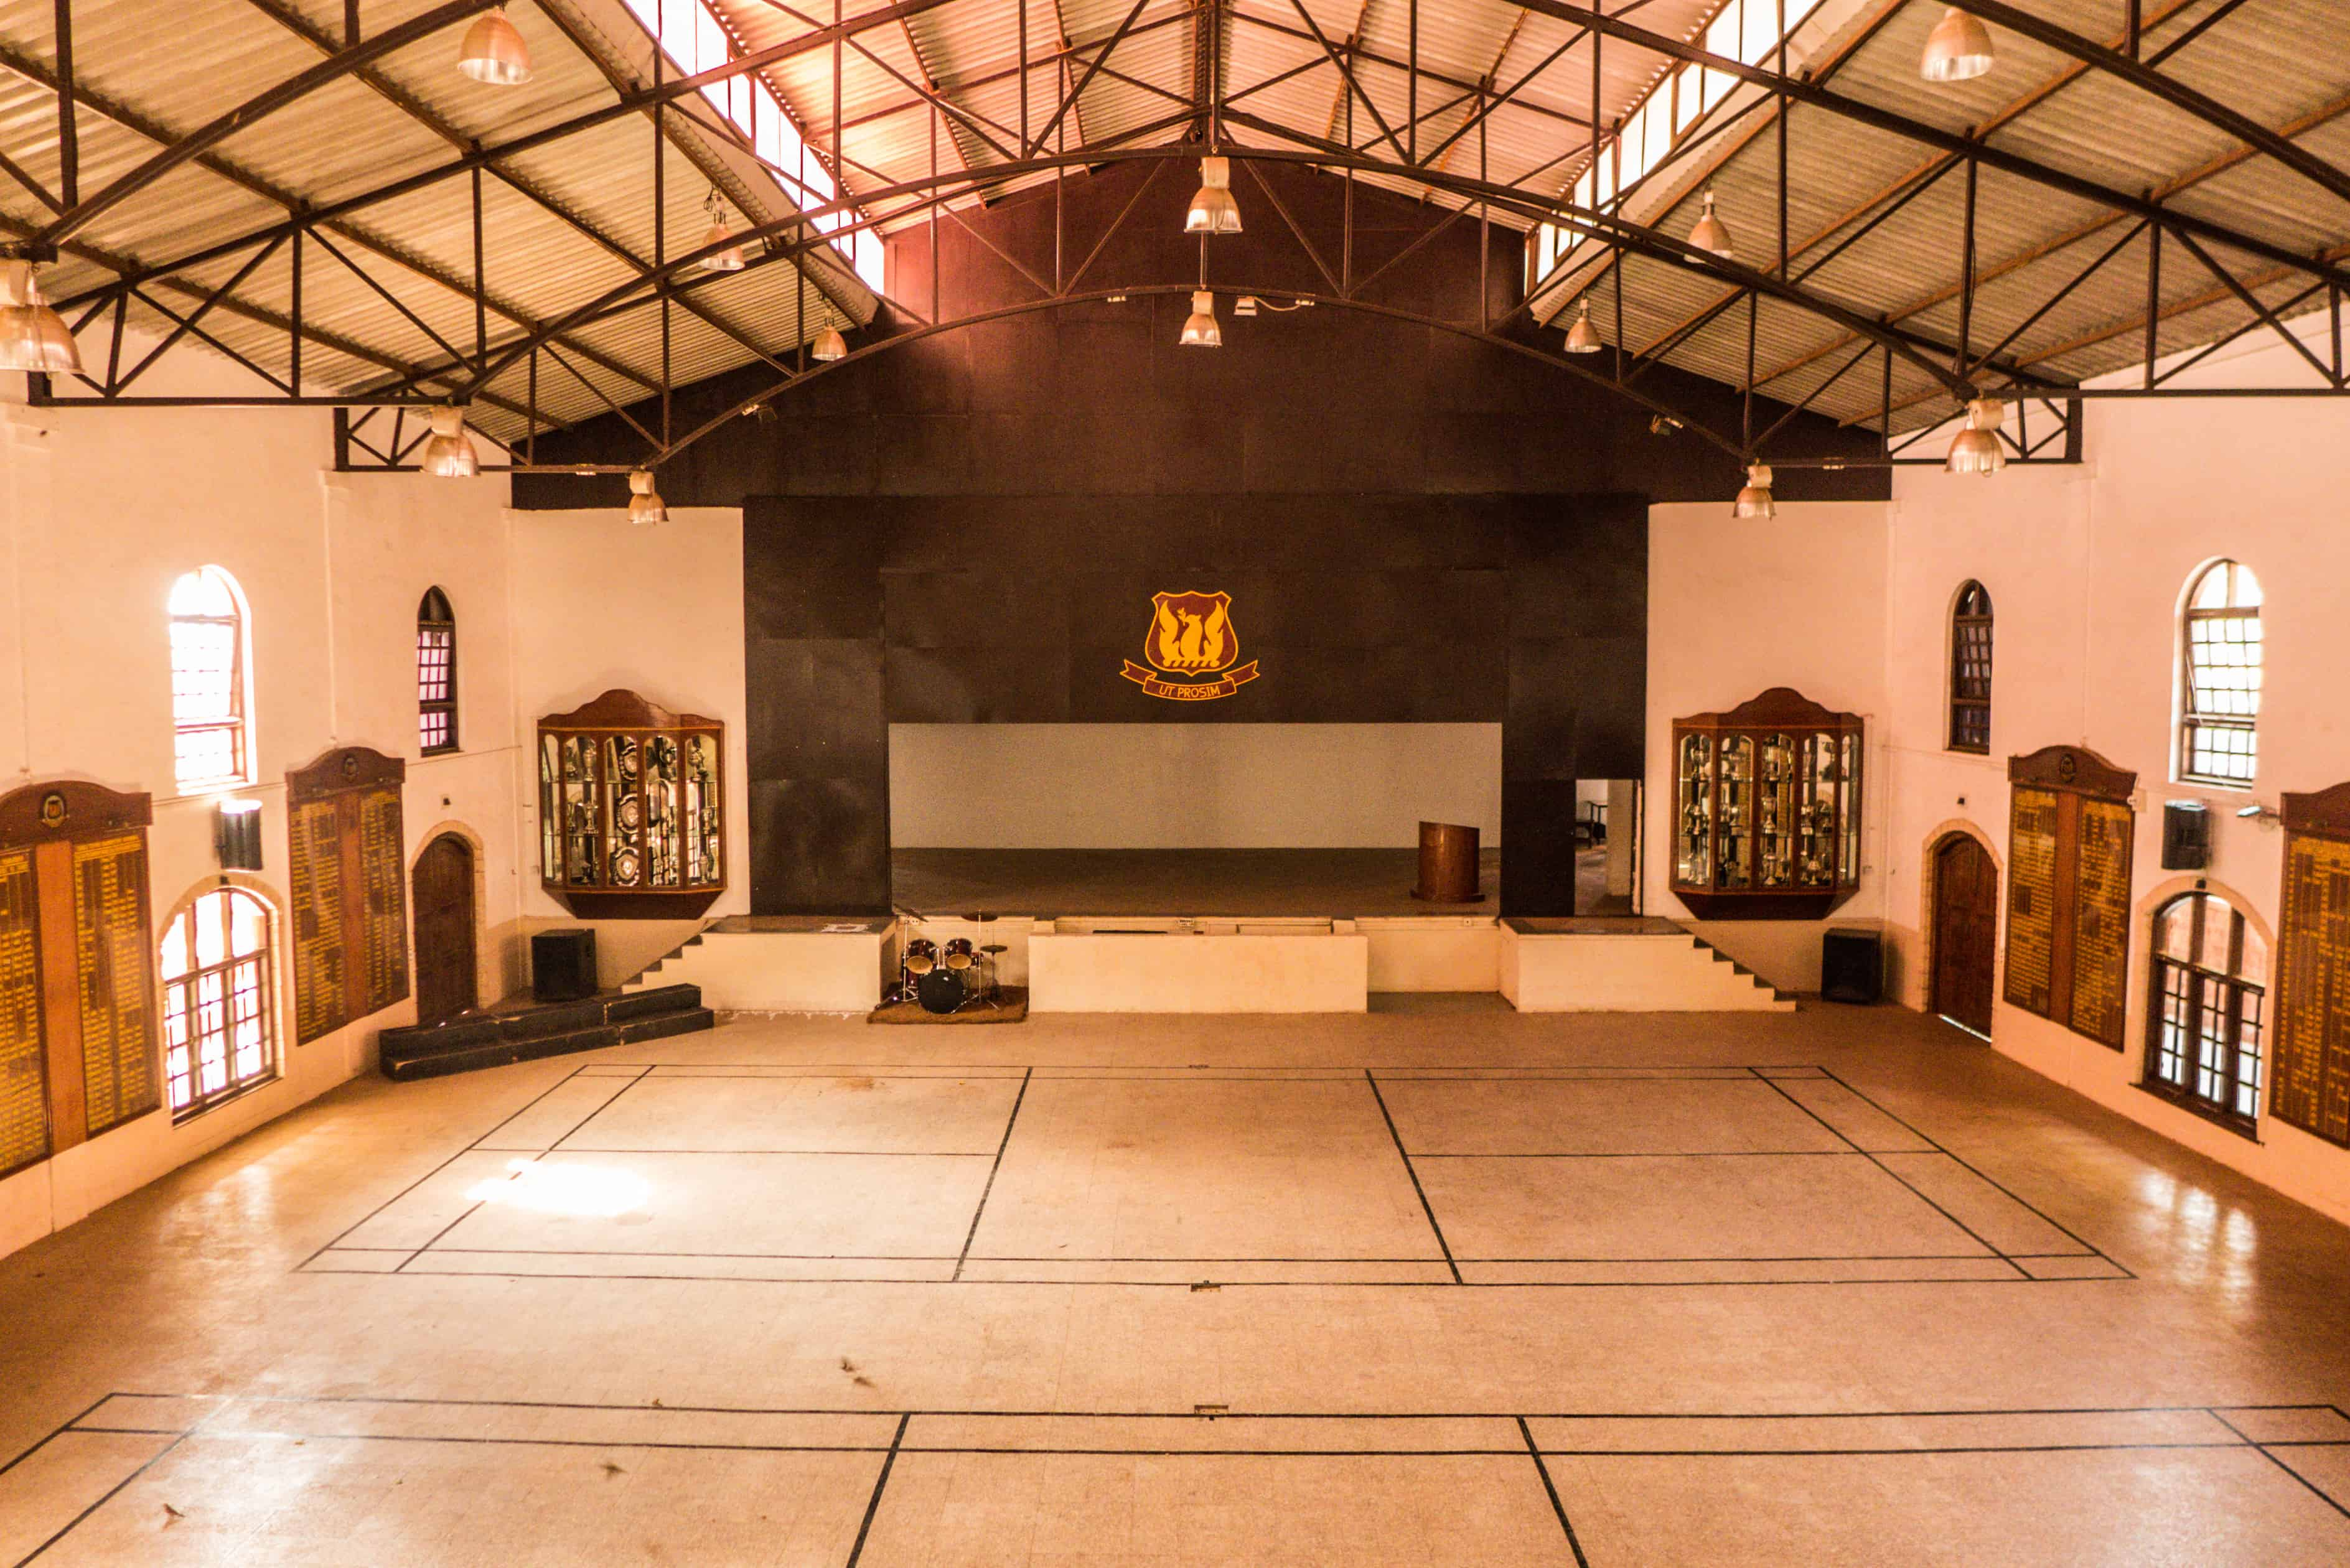 Panchgani, St. Petes's School, Freddie Mercury